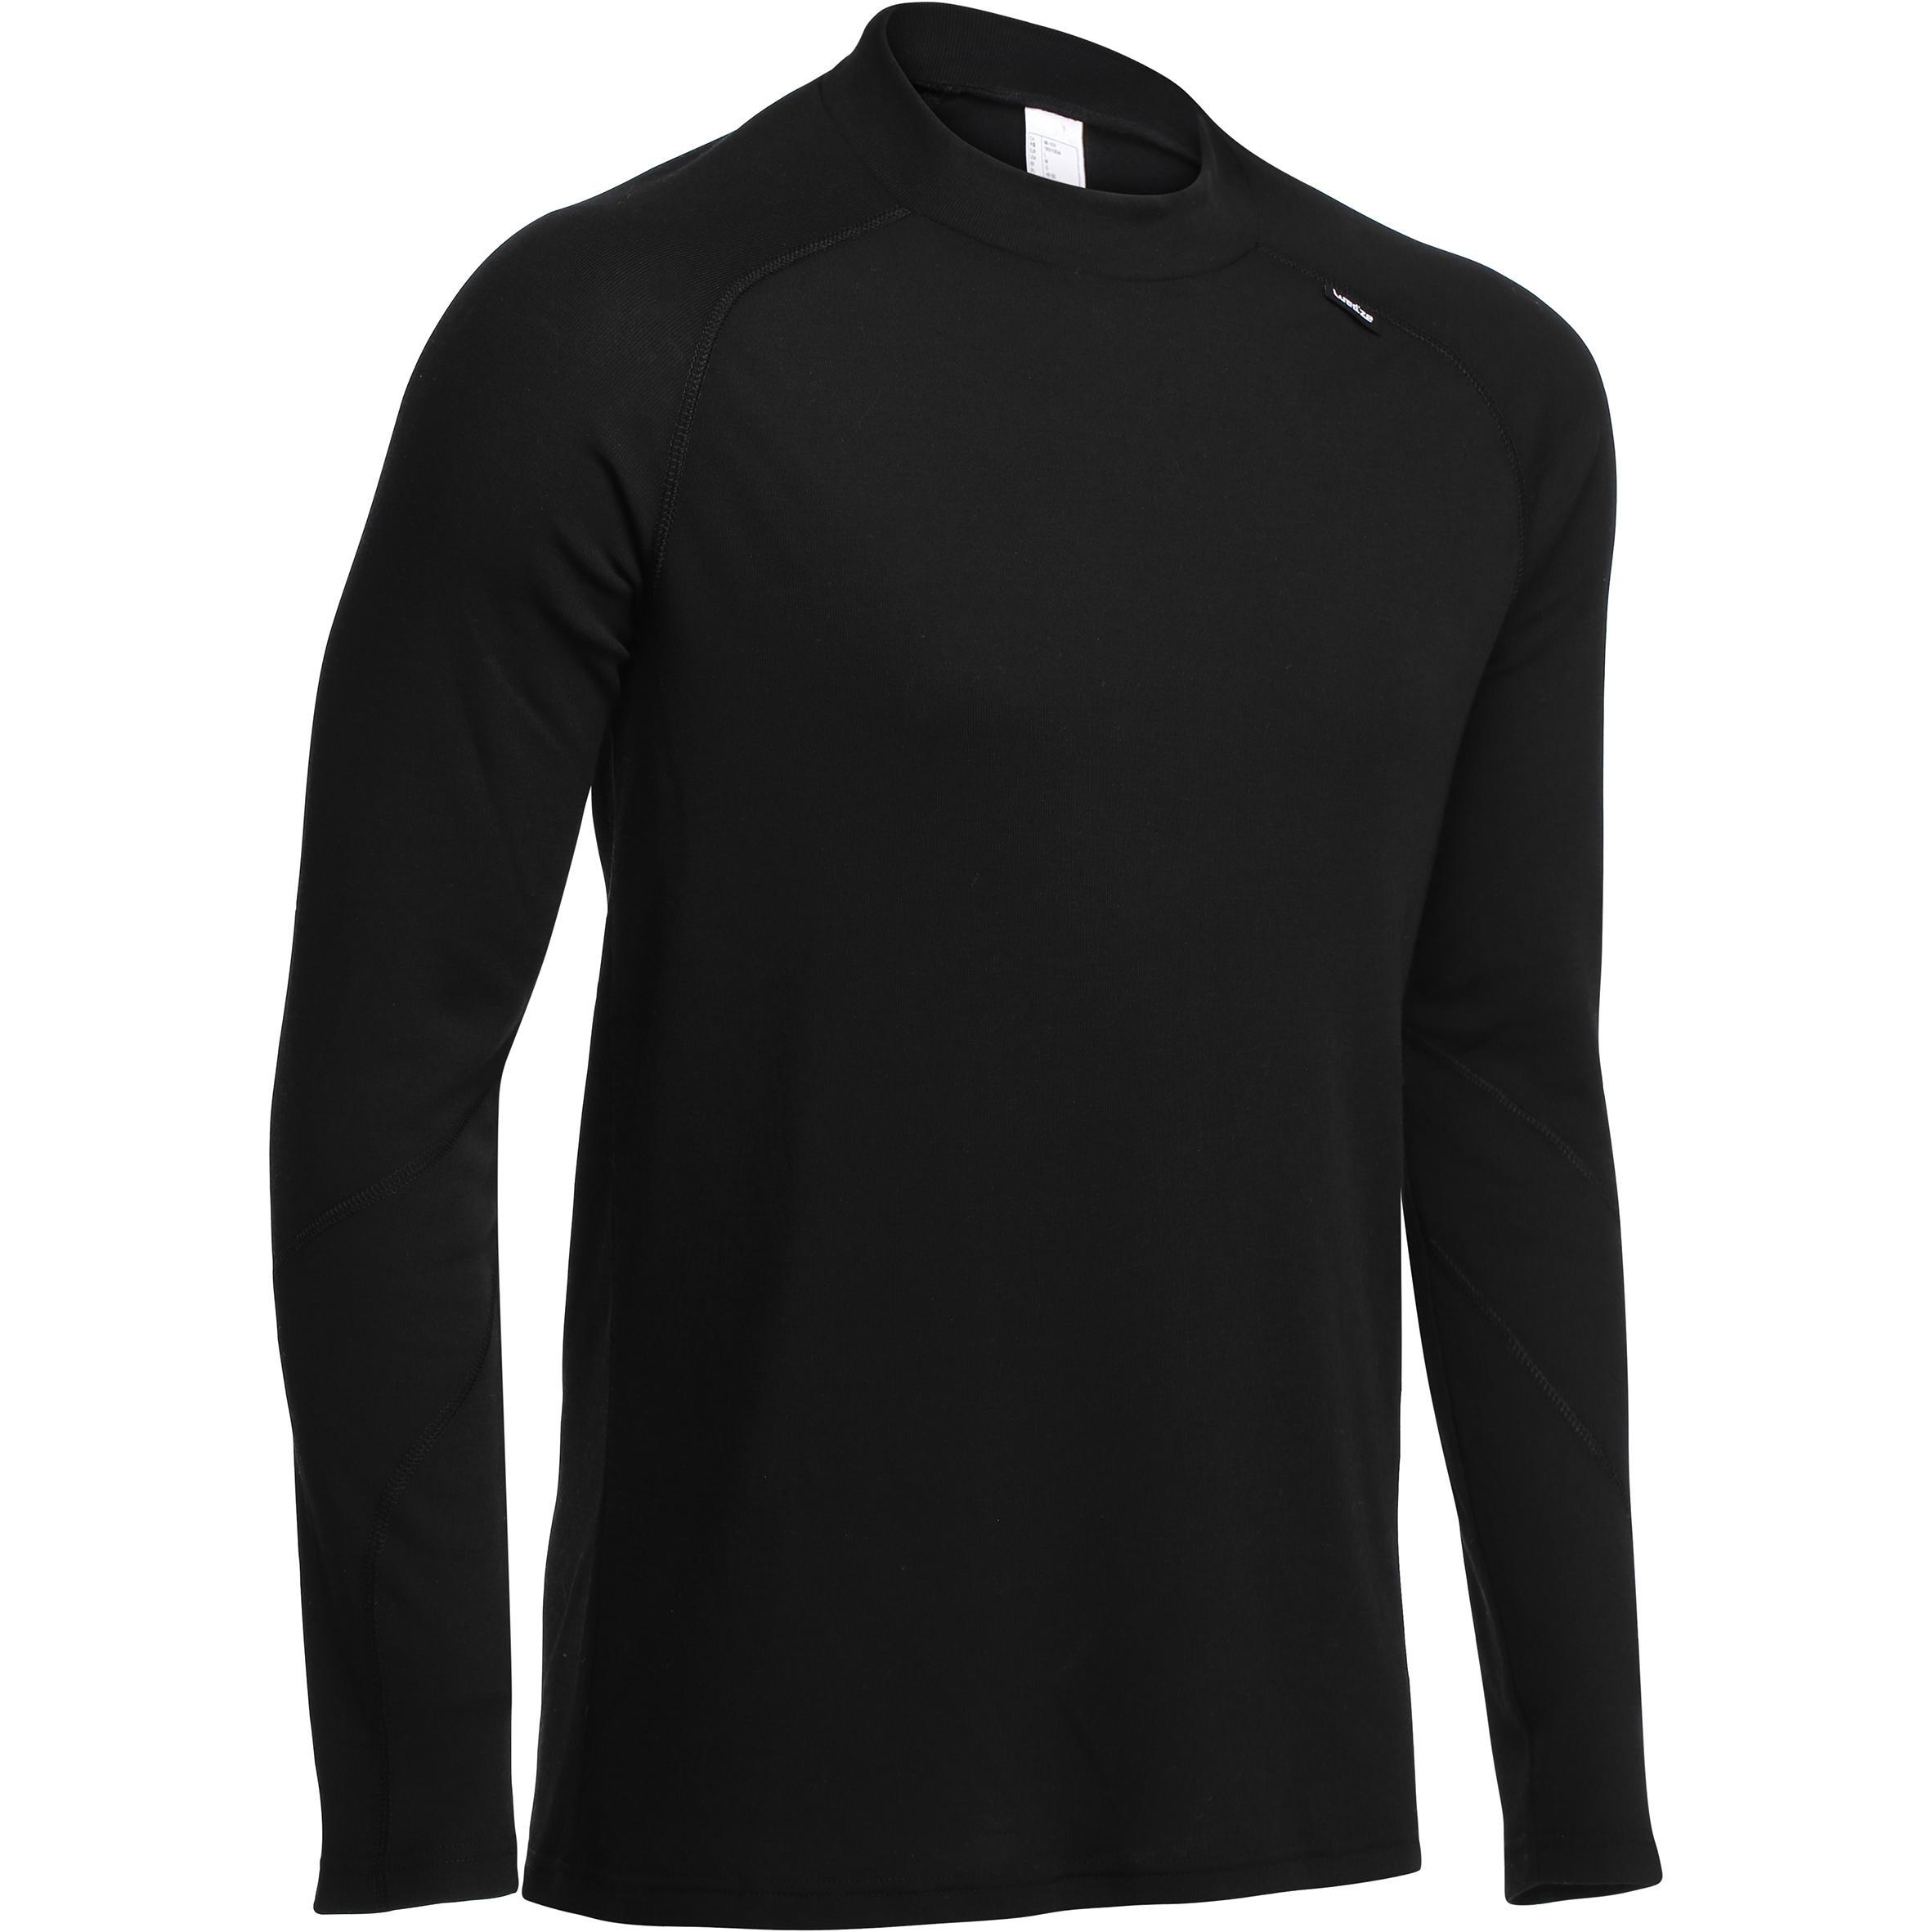 Simple Warm Men's Ski Base Layer - Black